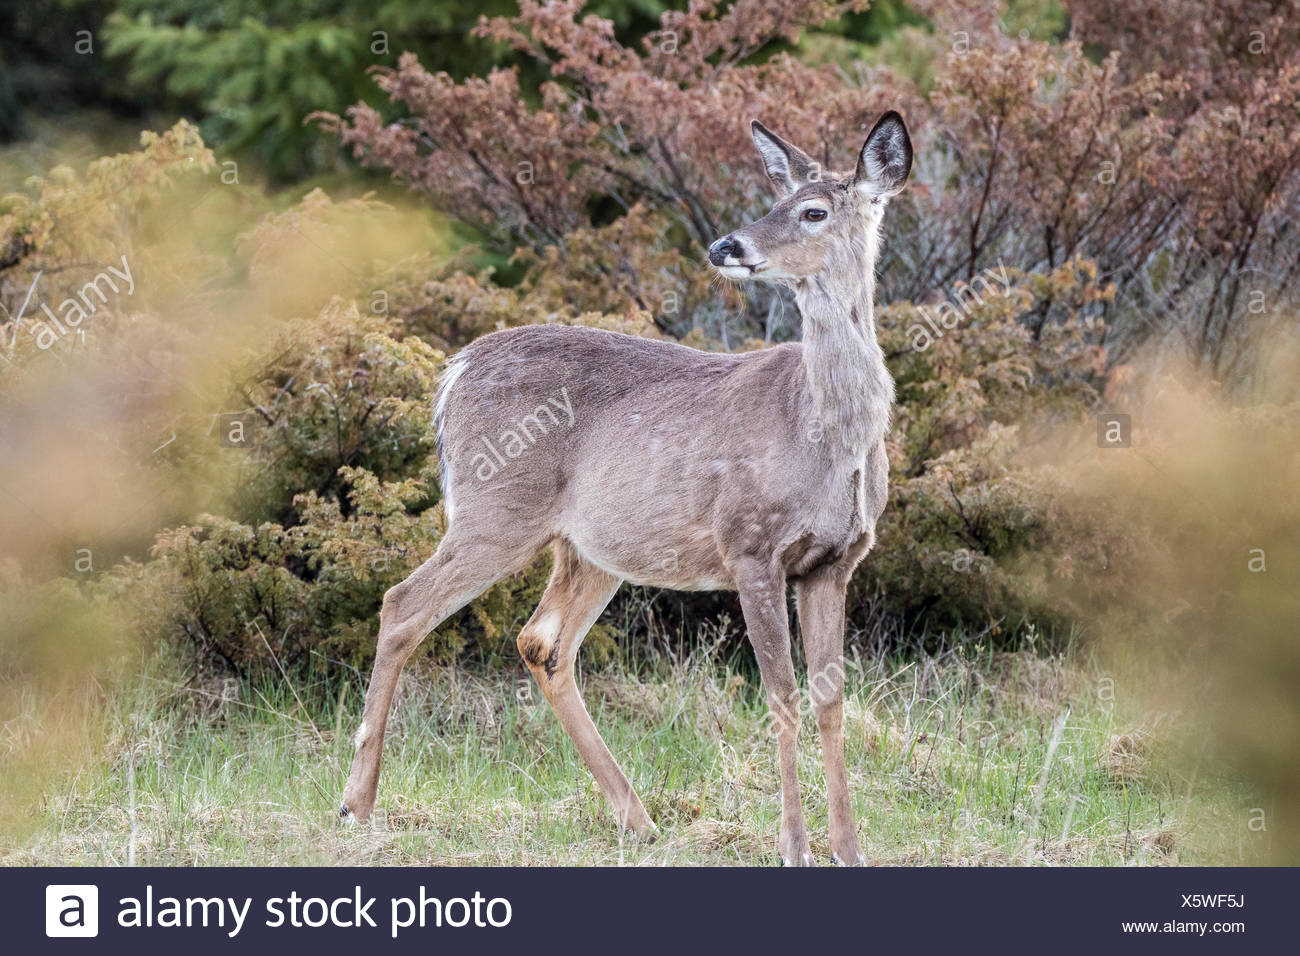 White-tailed Deer (Odocoileus virginianus), Barrie Island, Manitoulin Island, Ontario, Canada Stock Photo